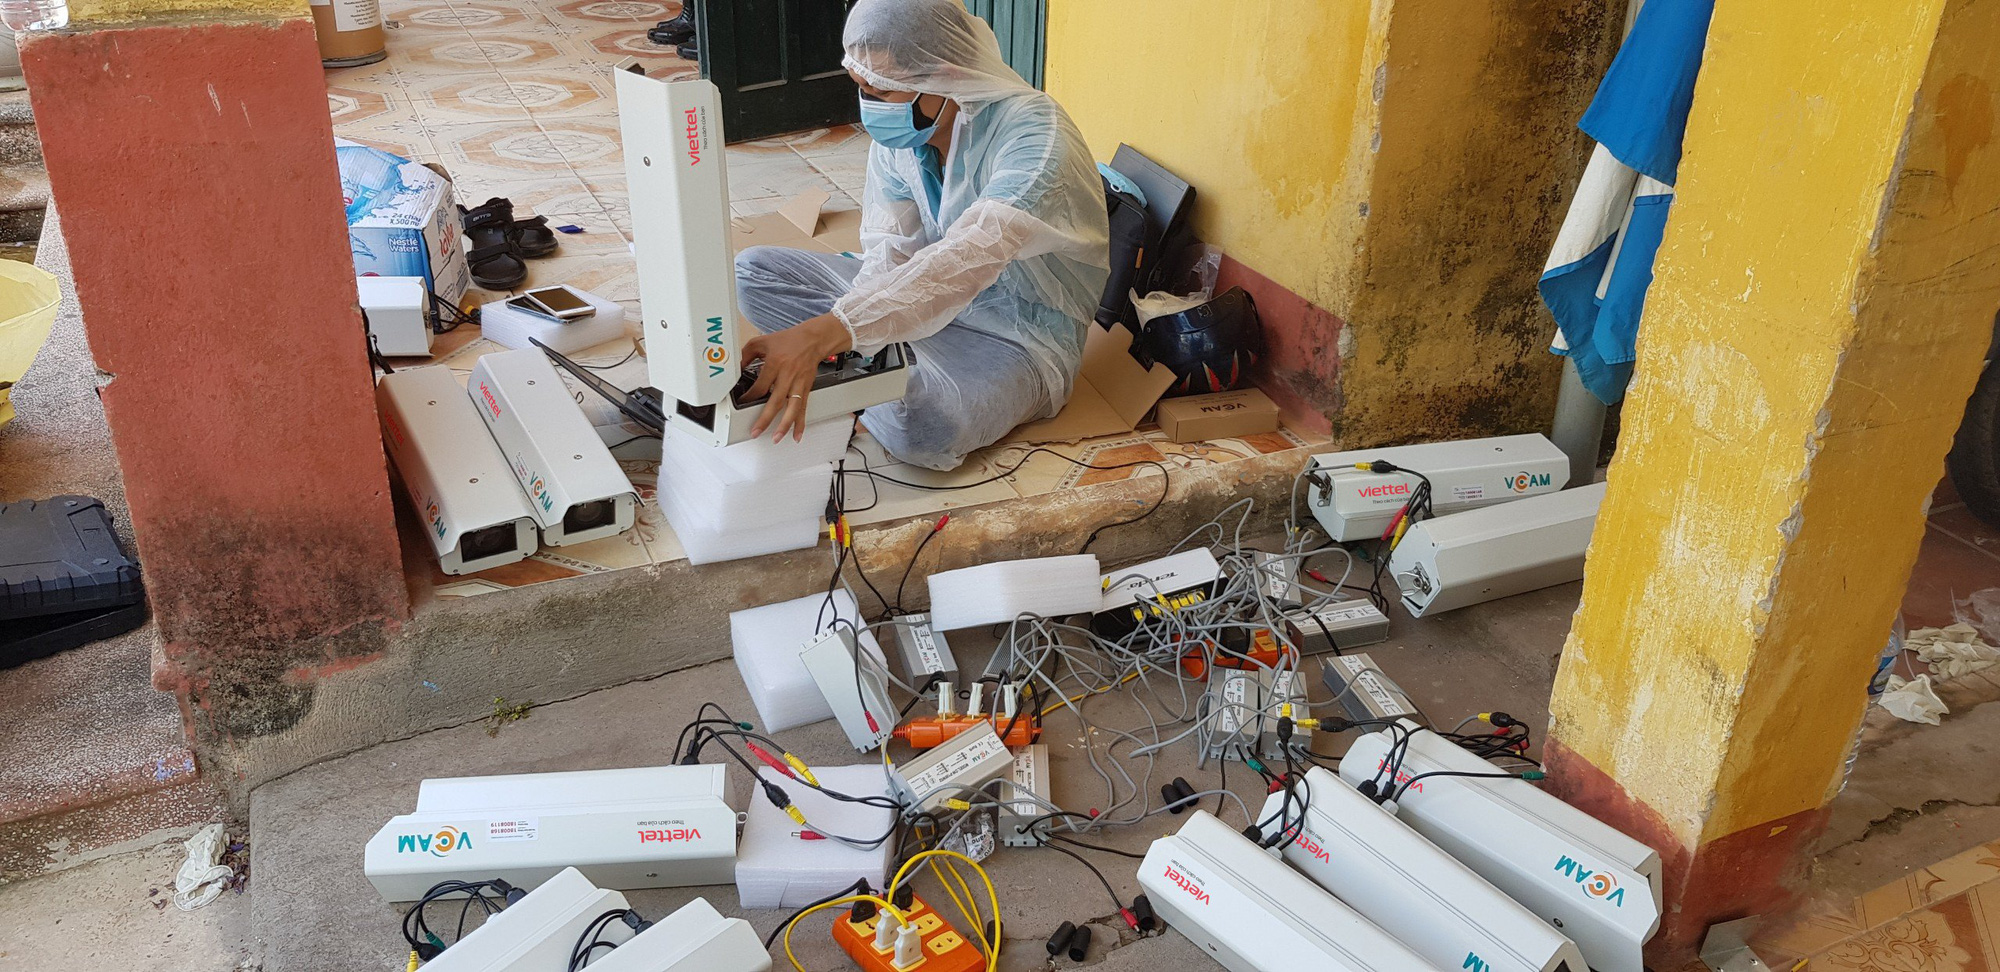 Vietnam installs 3,000 surveillance cameras in quarantine centers to quell coronavirus transmission